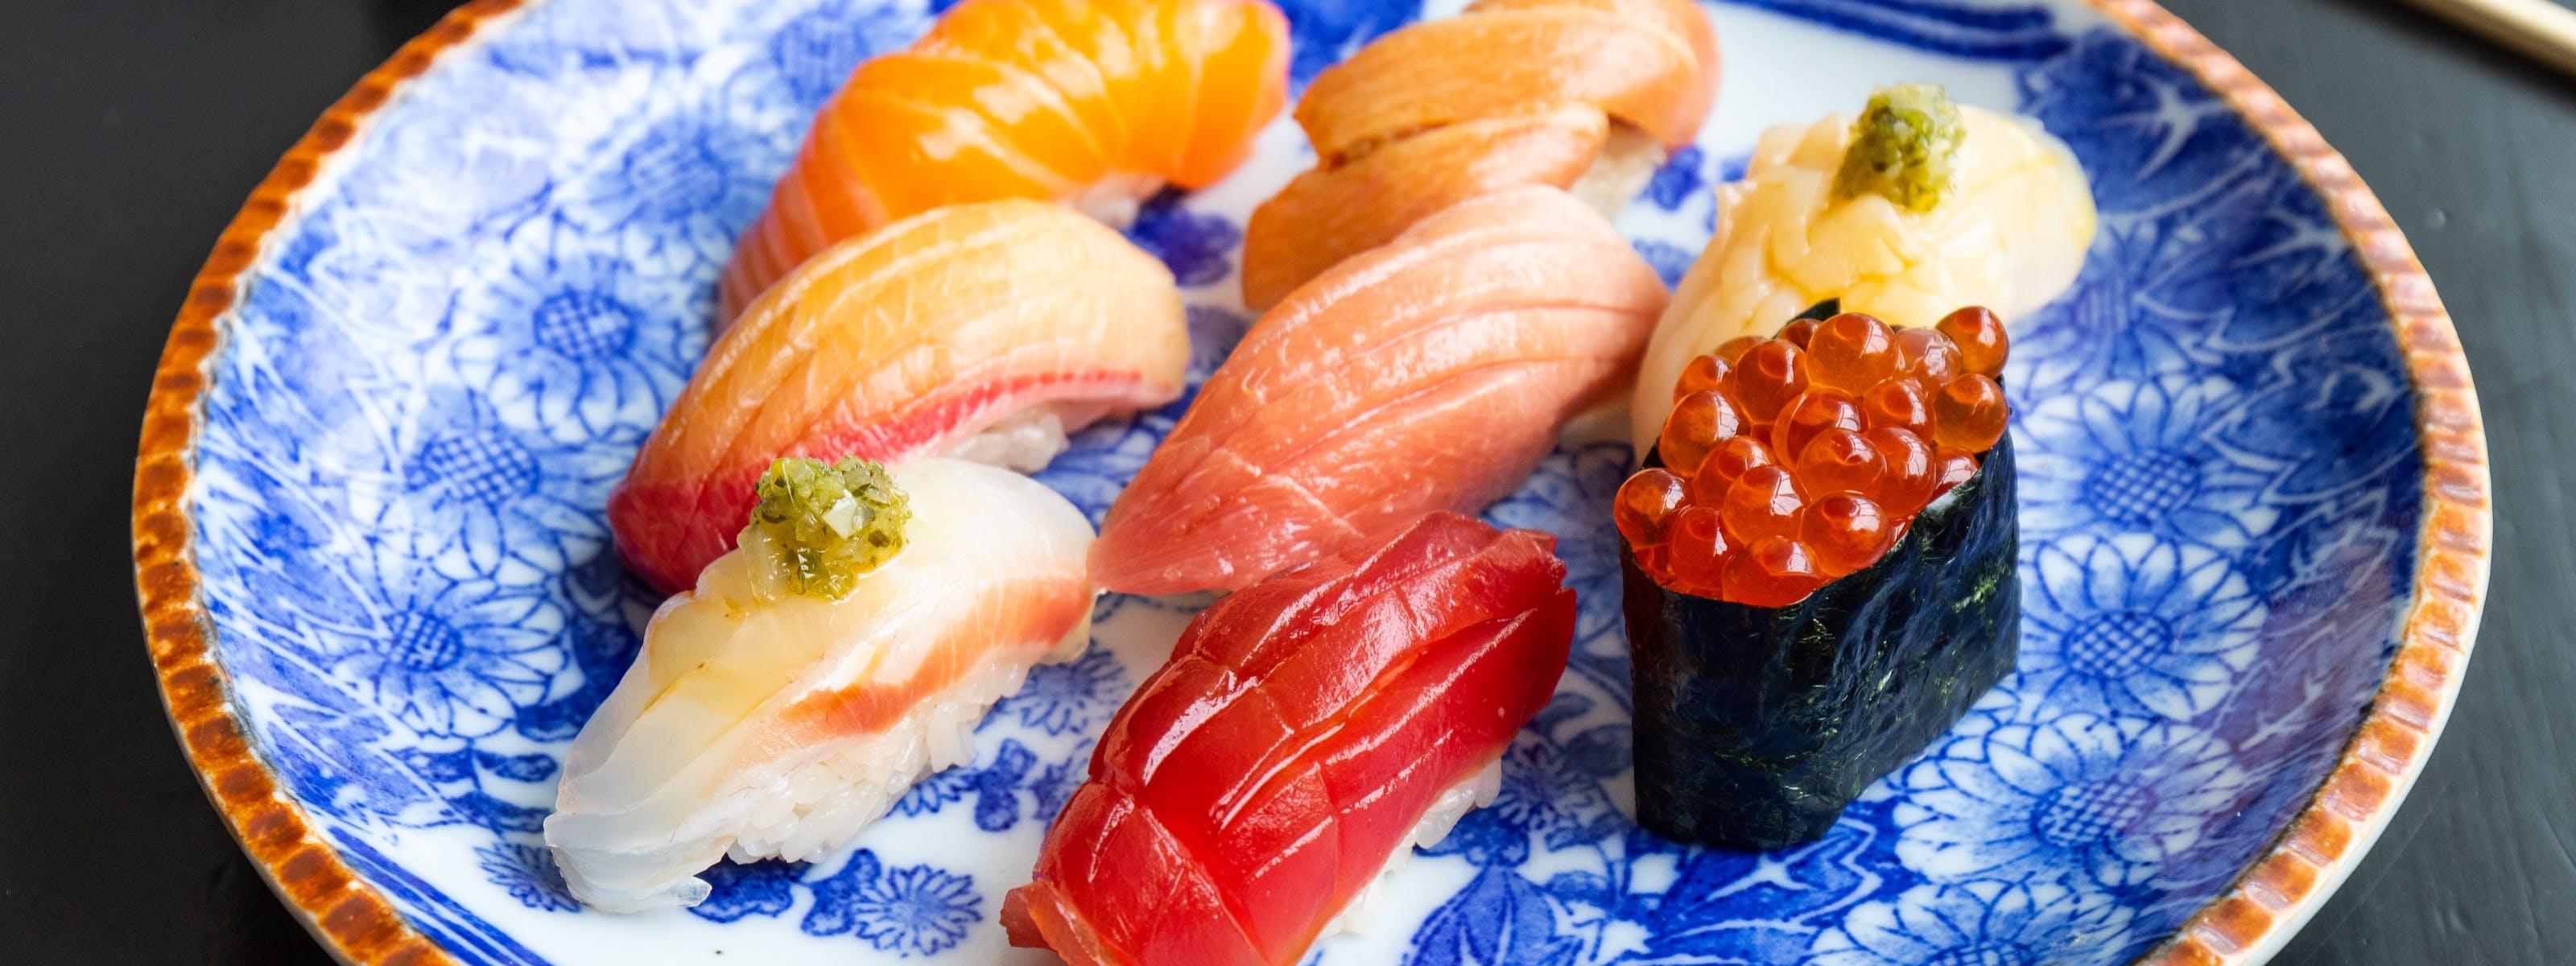 The Best Sushi Restaurants In Miami - Miami - The Infatuation